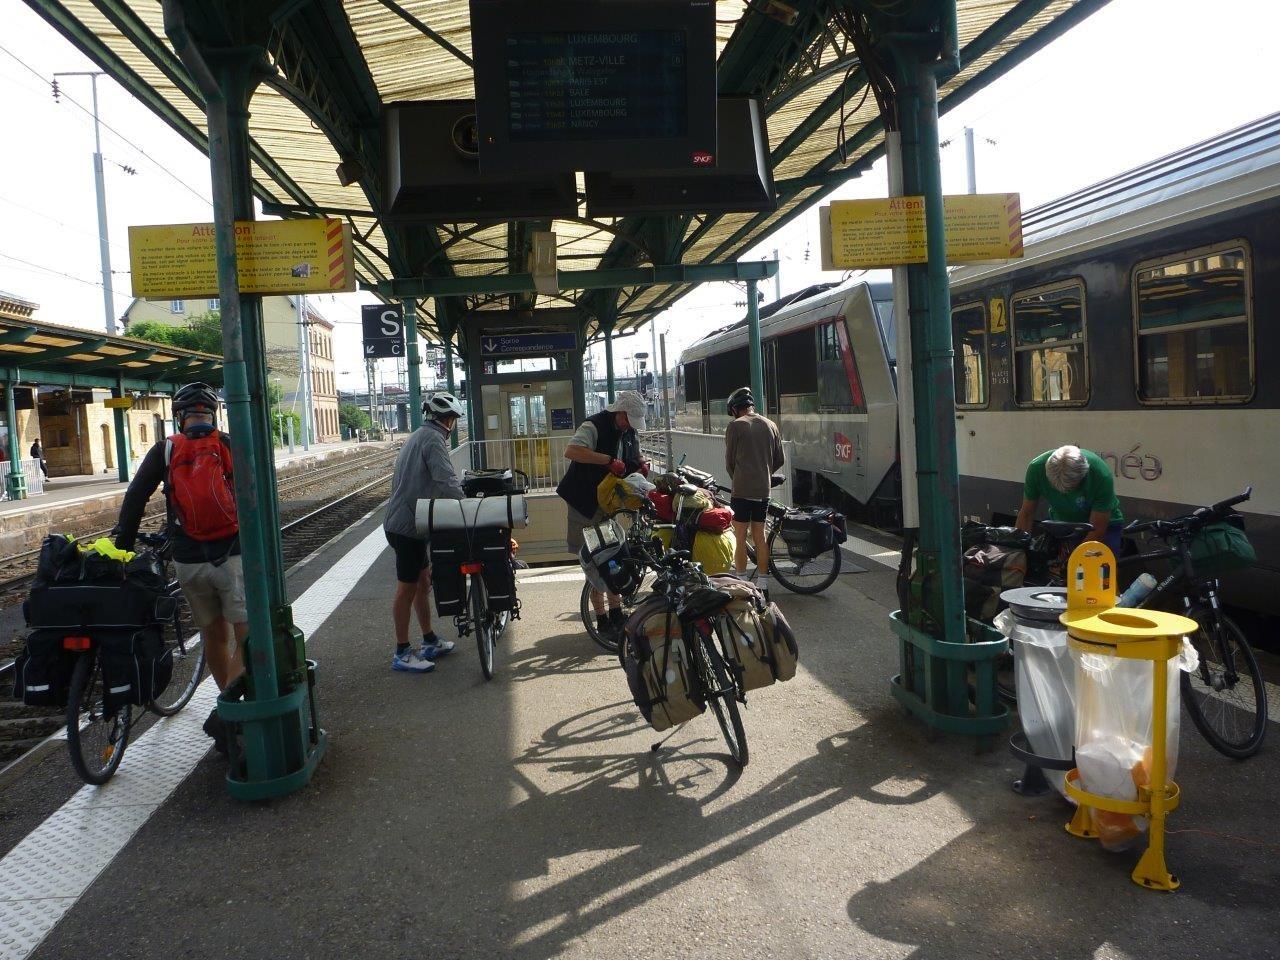 Gare de Thionville